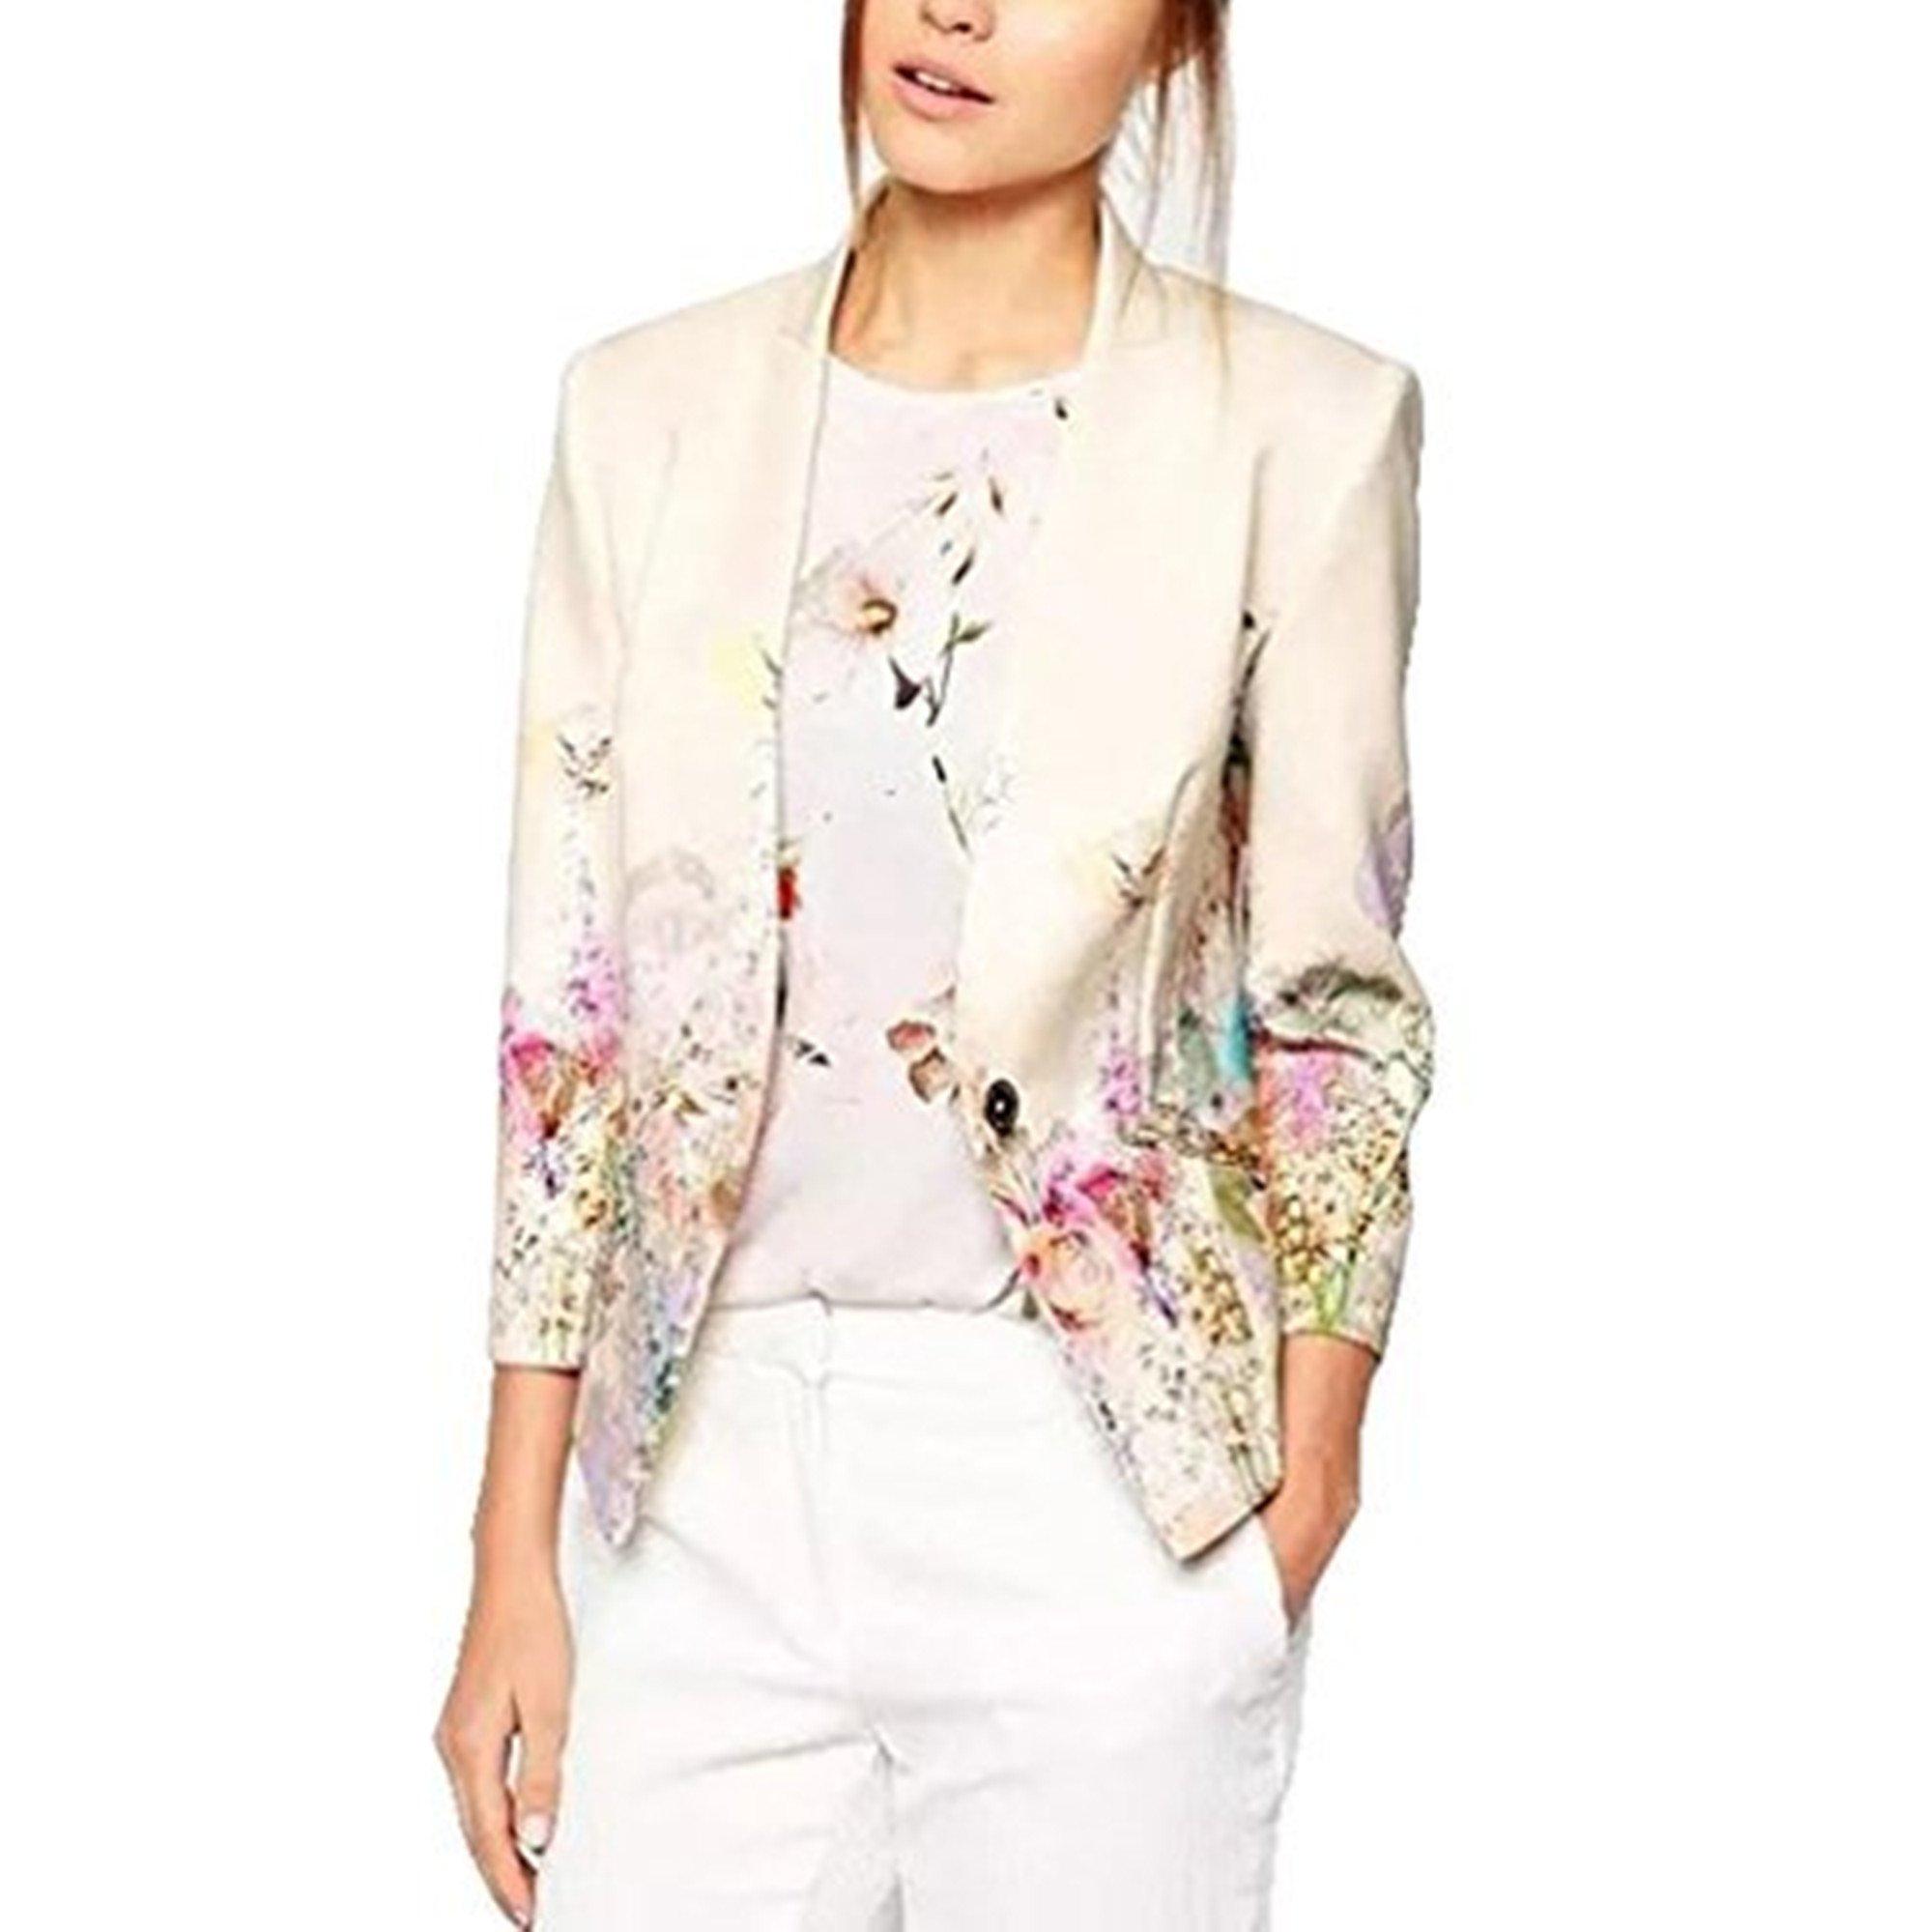 Lingswallow Women's Fit Casual White Vintage Floral Print Slim Button Blazers (M US 2-4, Floral)